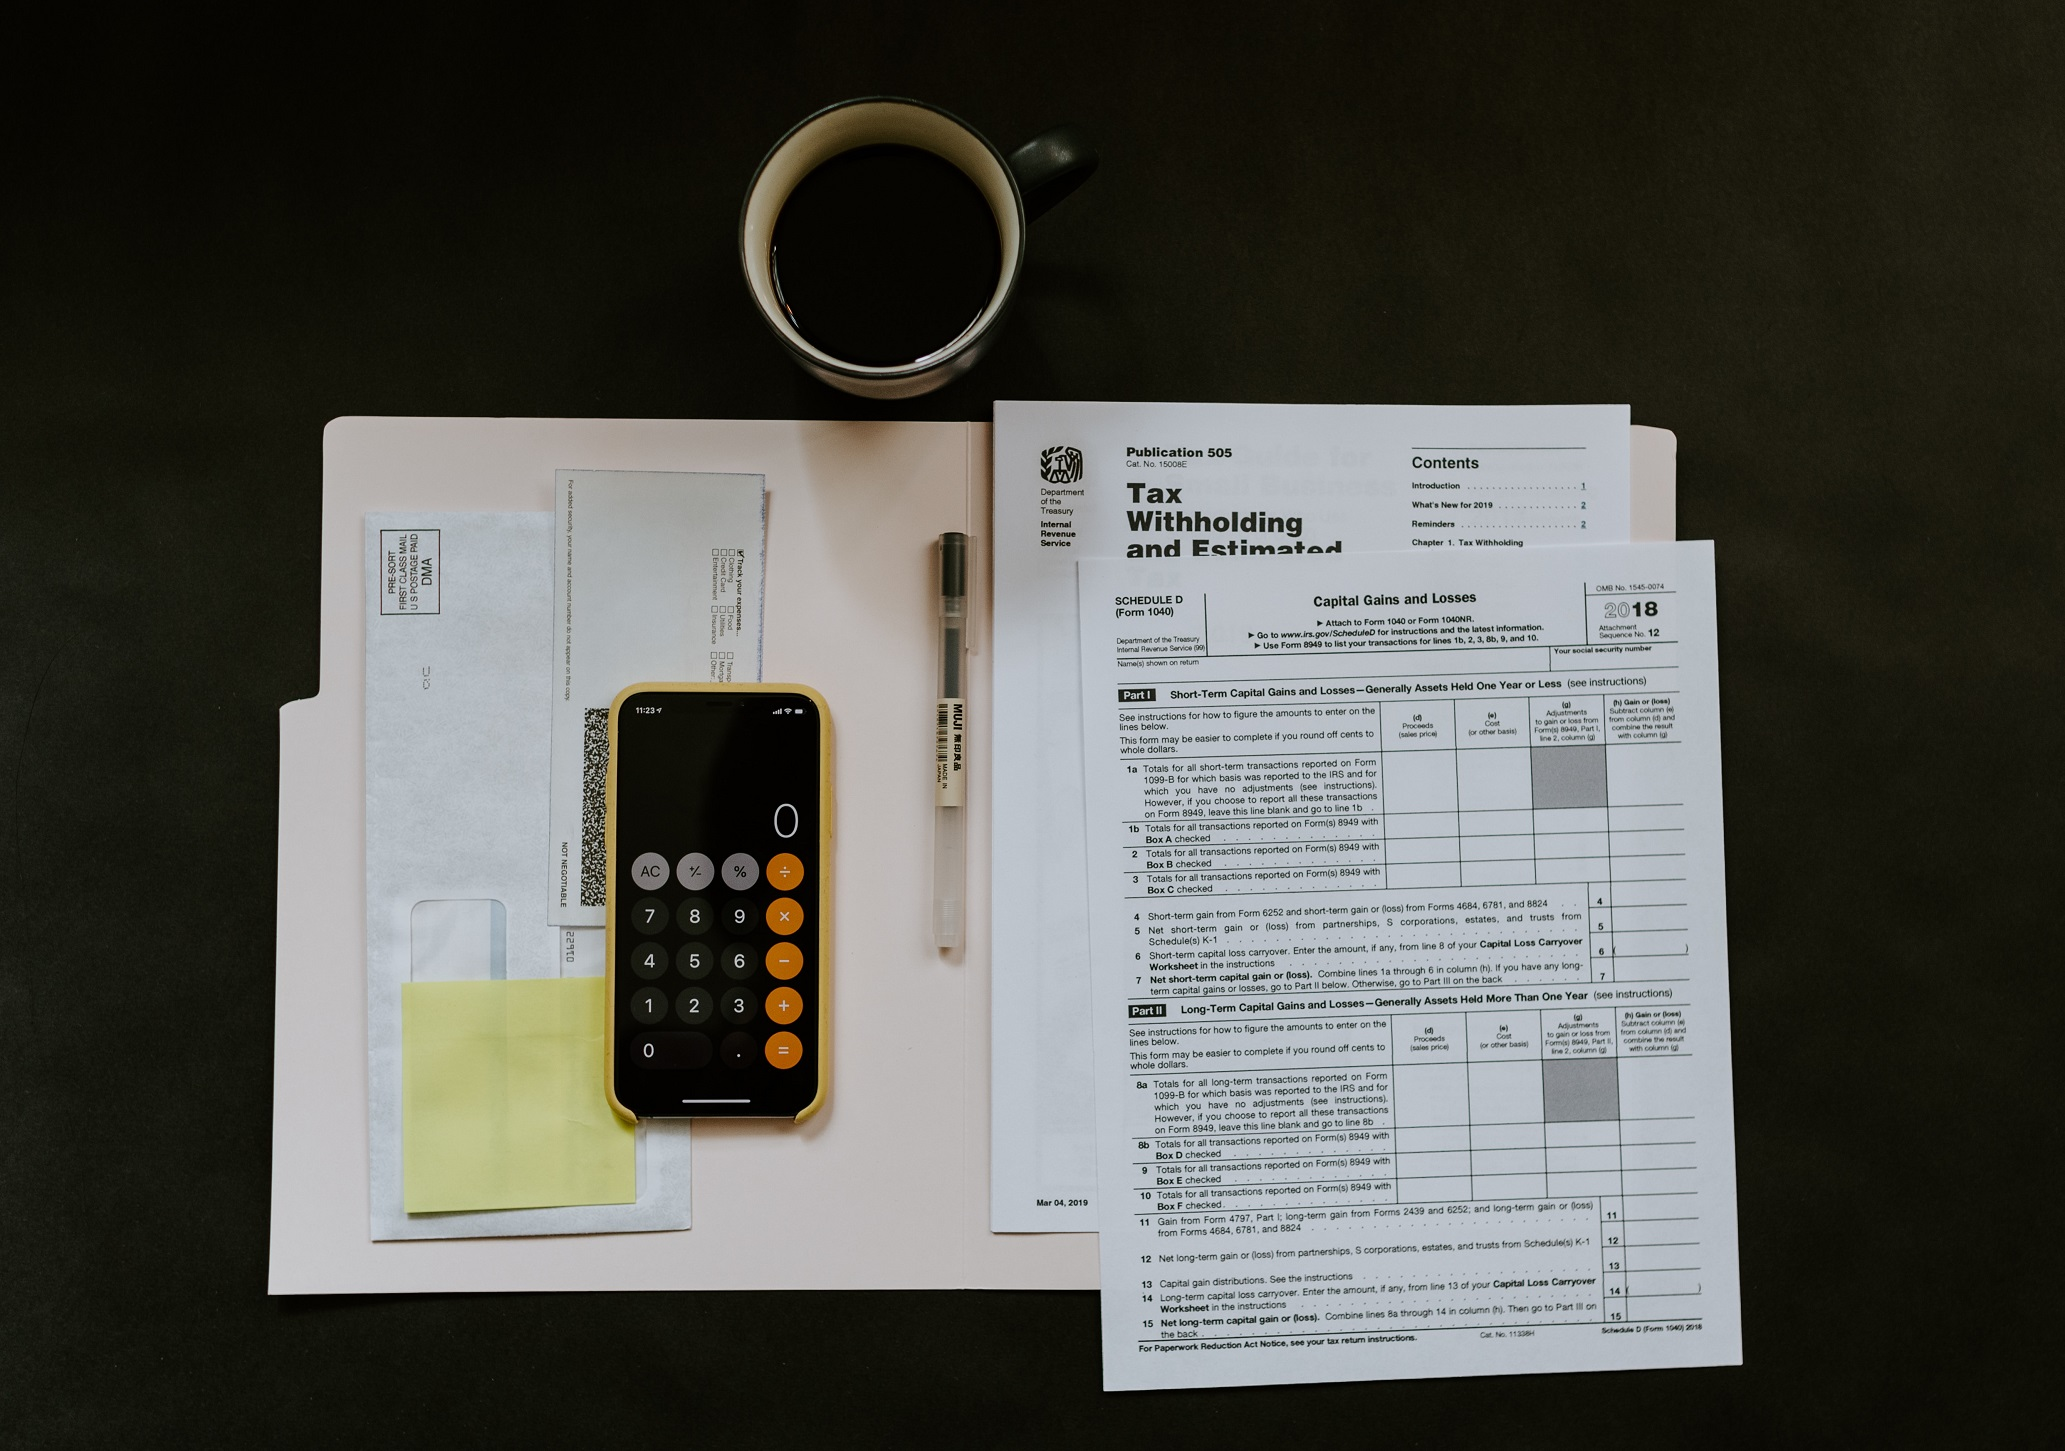 Accurantusa.com Business and Individual Tax Compliance